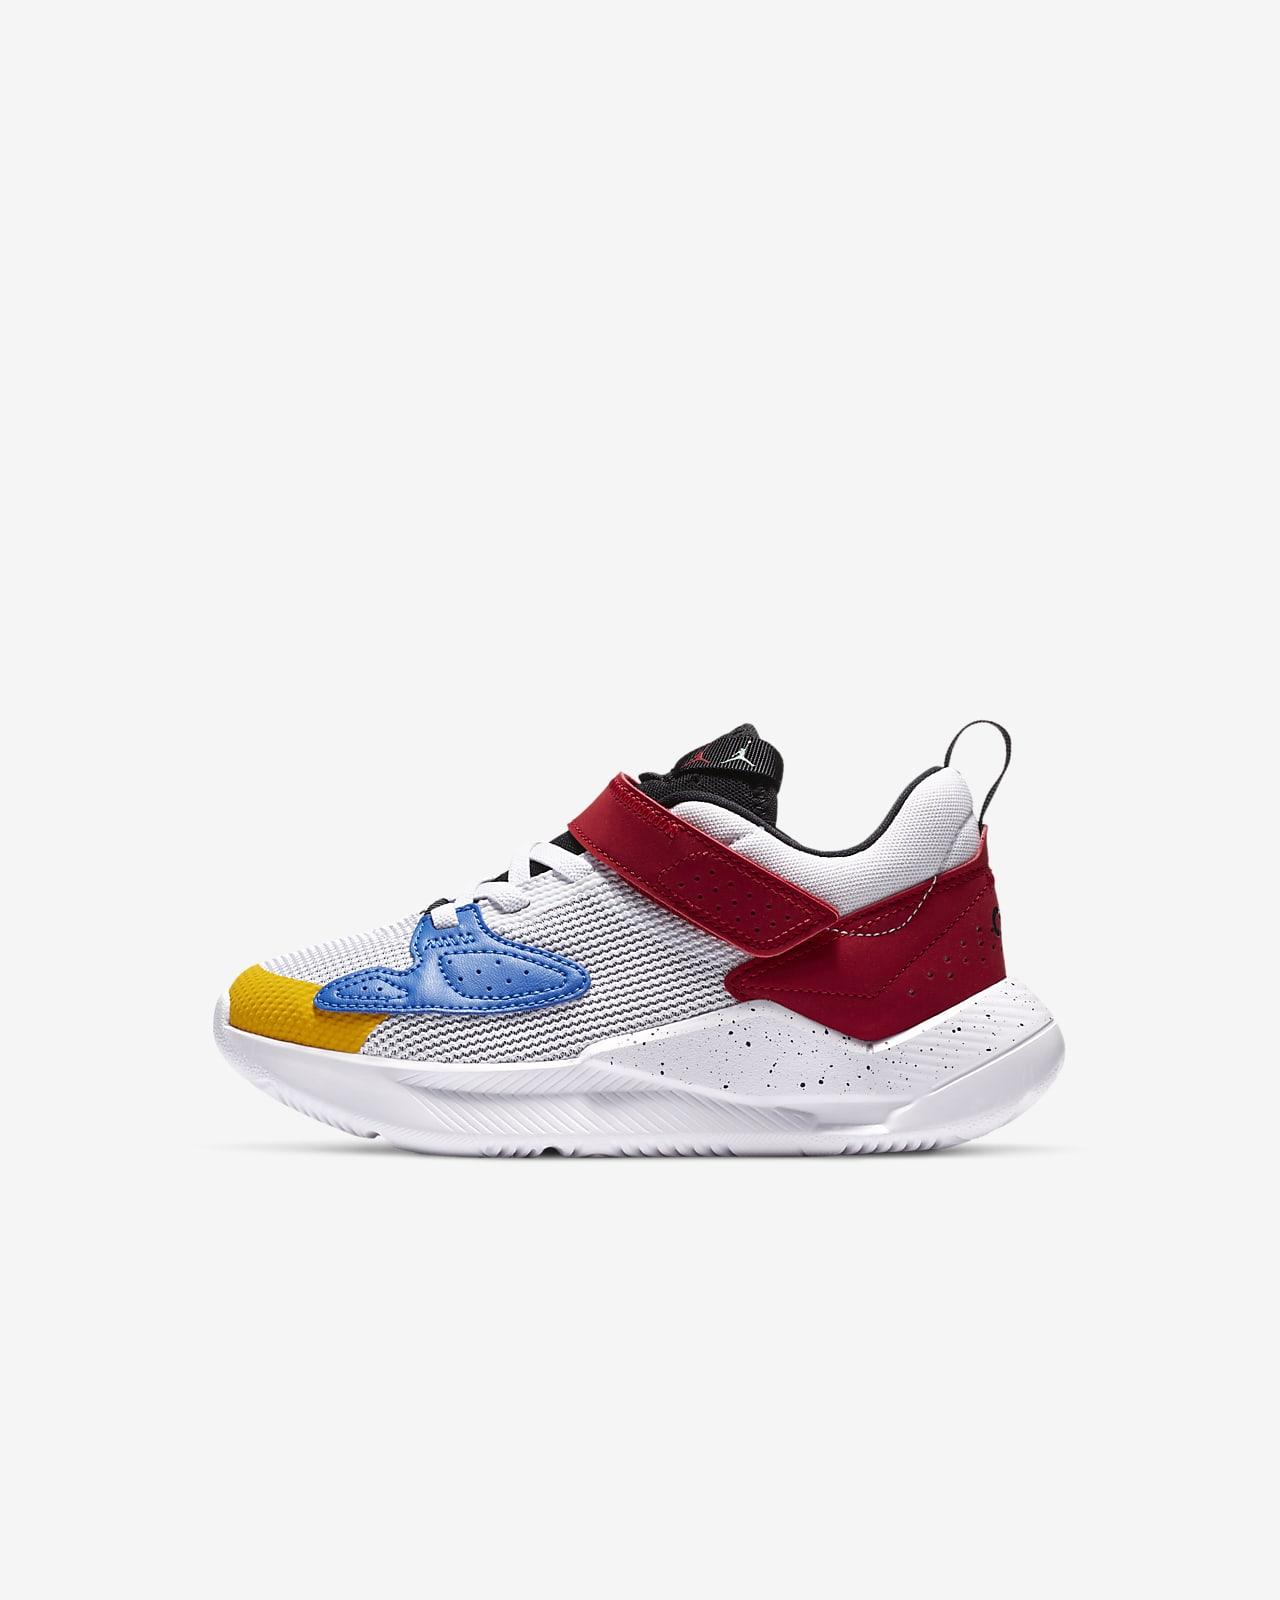 Jordan Cadence Little Kids' Shoe. Nike.com